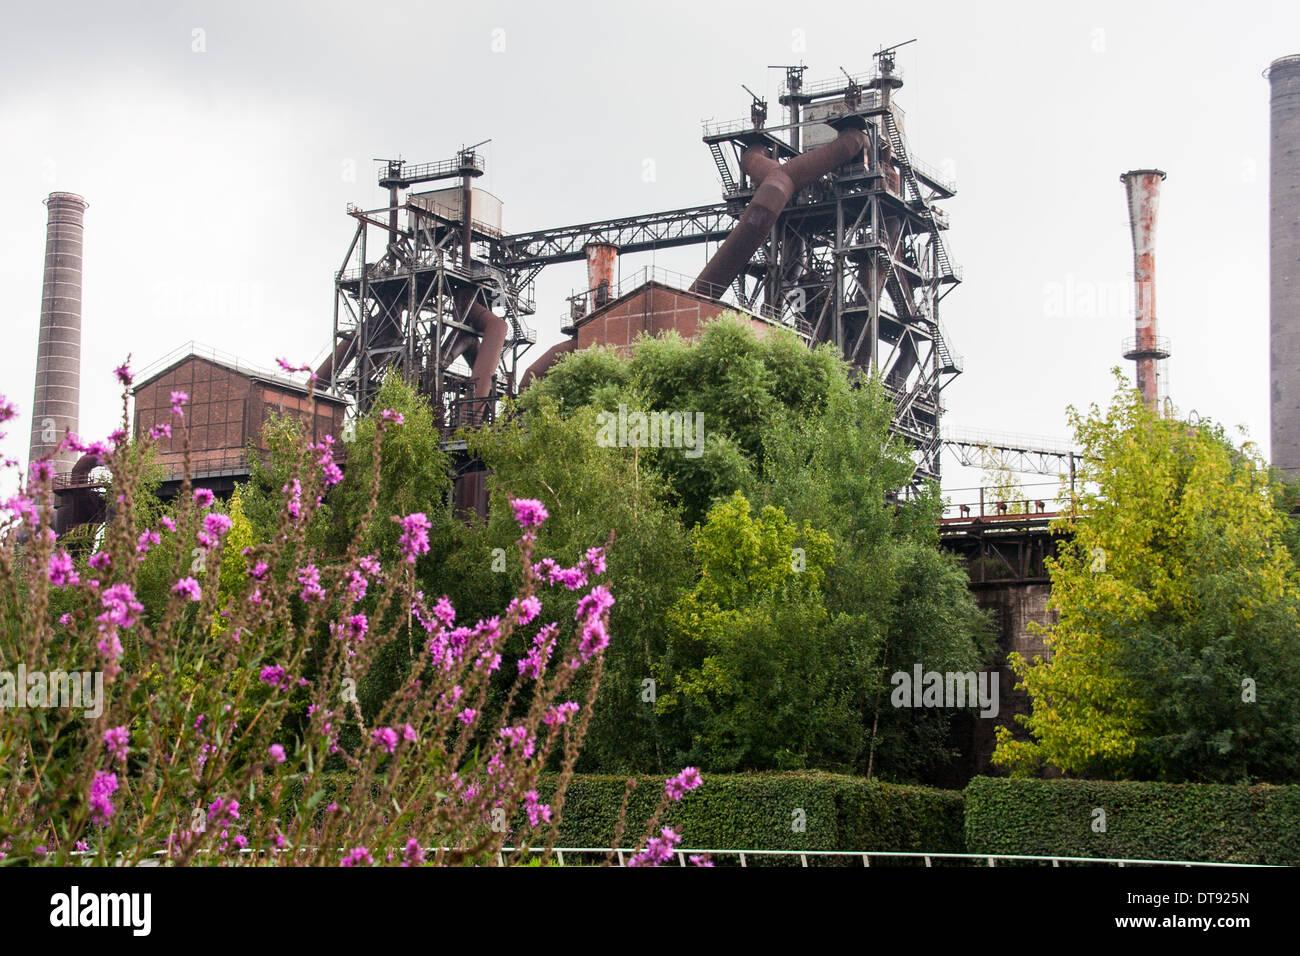 Landschaftpark Duisburg Nord industry and nature - Stock Image